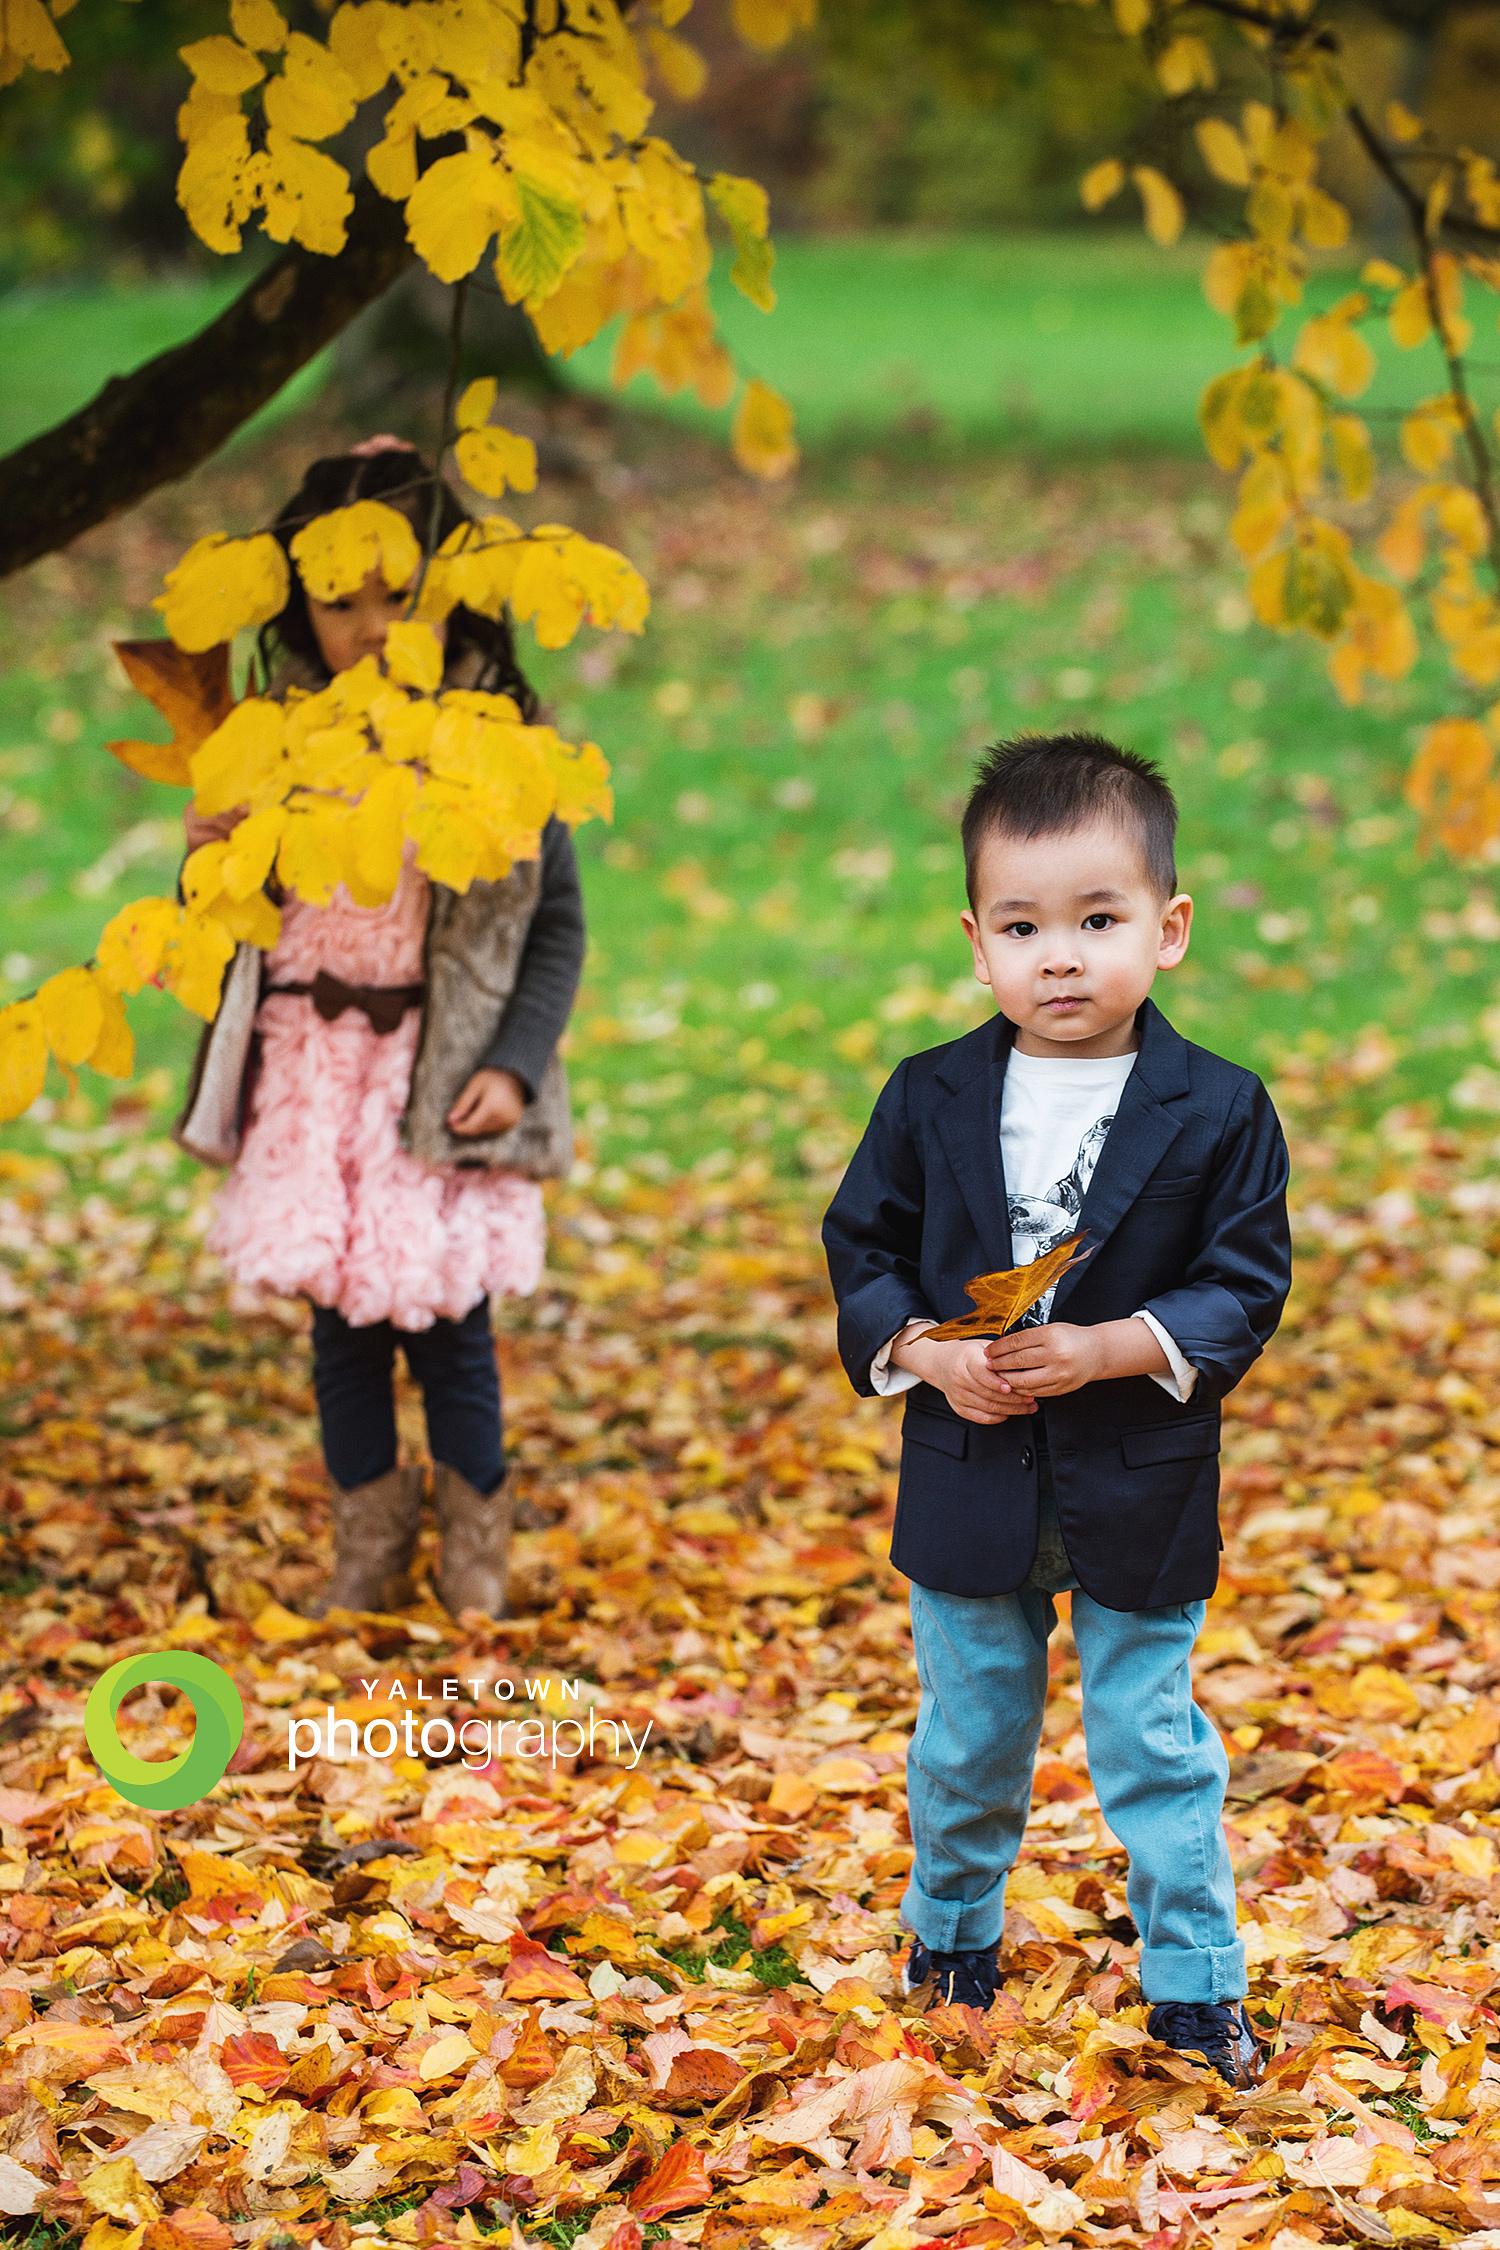 058_MelissaPaul-Yeung_Family_11082014_YP4_0507.jpg